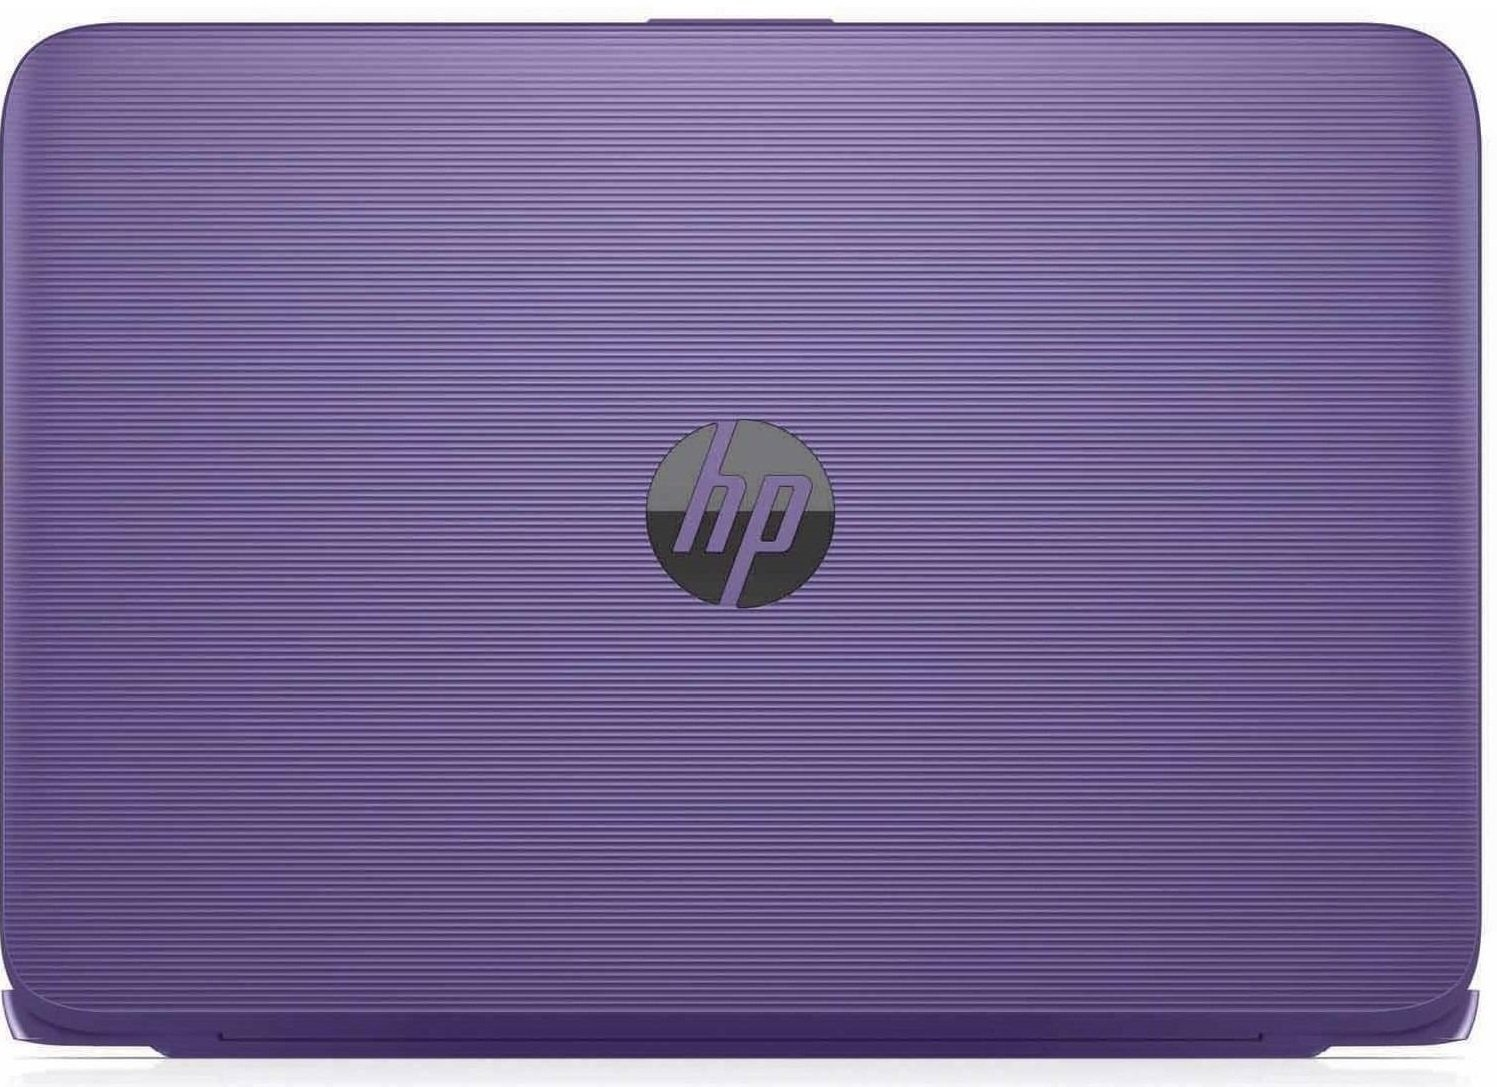 2017 HP Stream 11 11.6 inch Flagship Laptop Computer, Intel Celeron N3060 1.6GHz, 4GB RAM, 32GB eMMC drive, 802.11ac WiFi, USB 3.1 port, Windows 10 Home, Purple (Certified Refurbished)